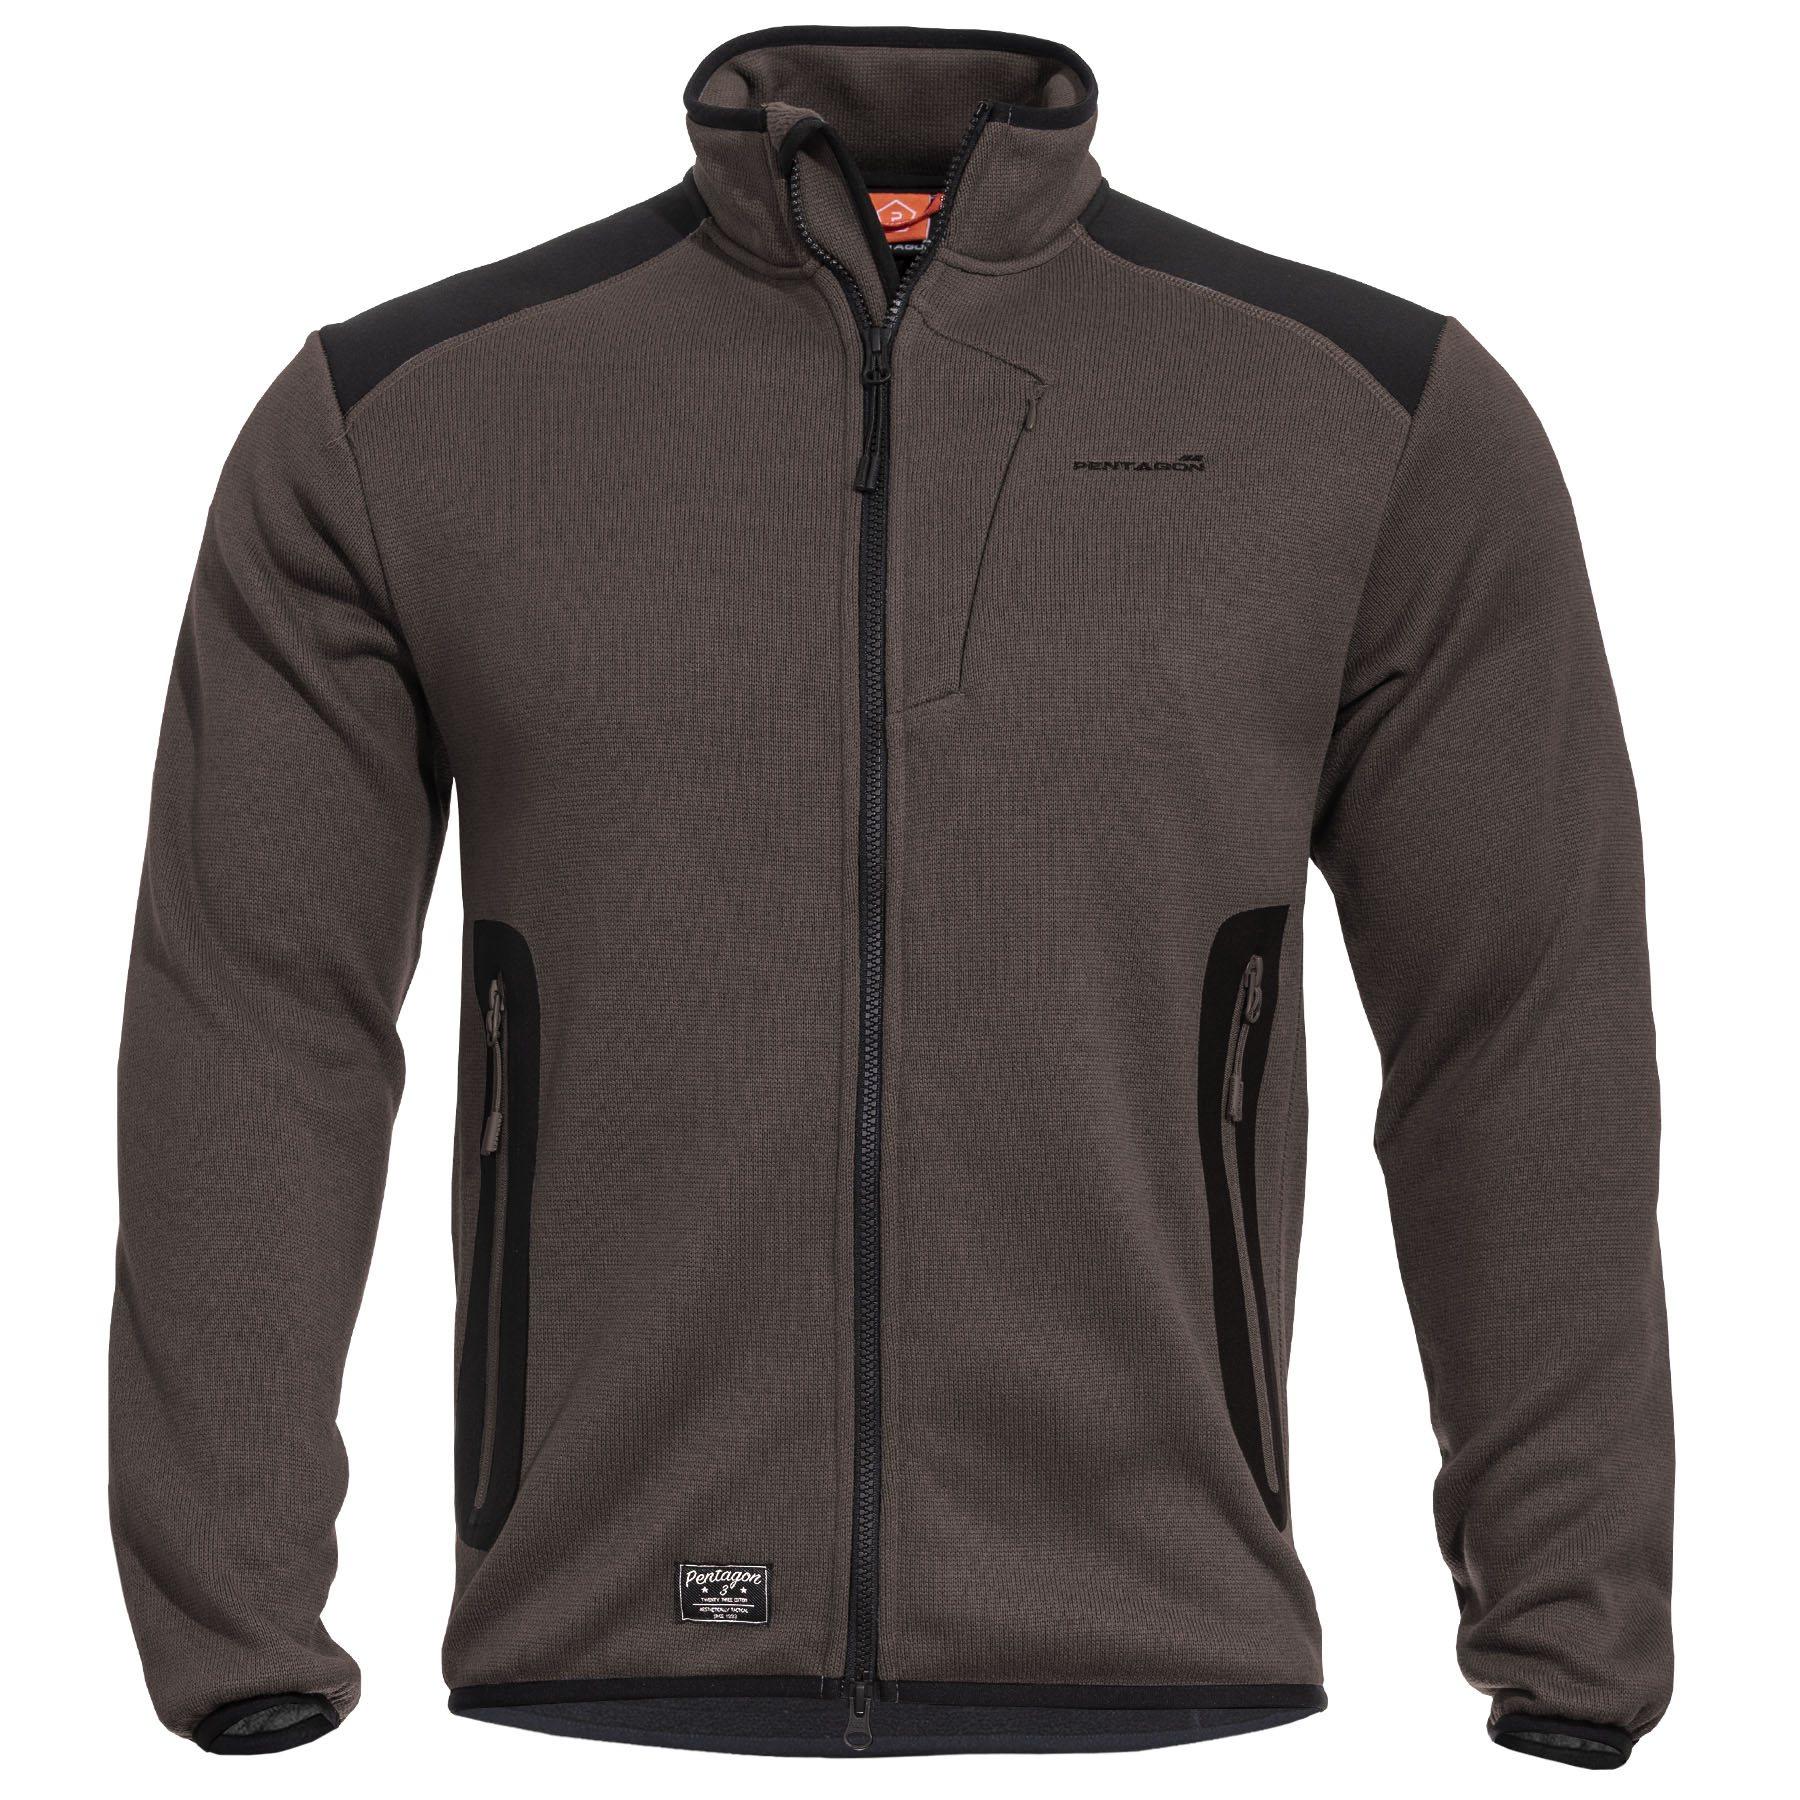 AMINTOR Fleece Sweater TERRA BROWN PENTAGON K08028-26 L-11